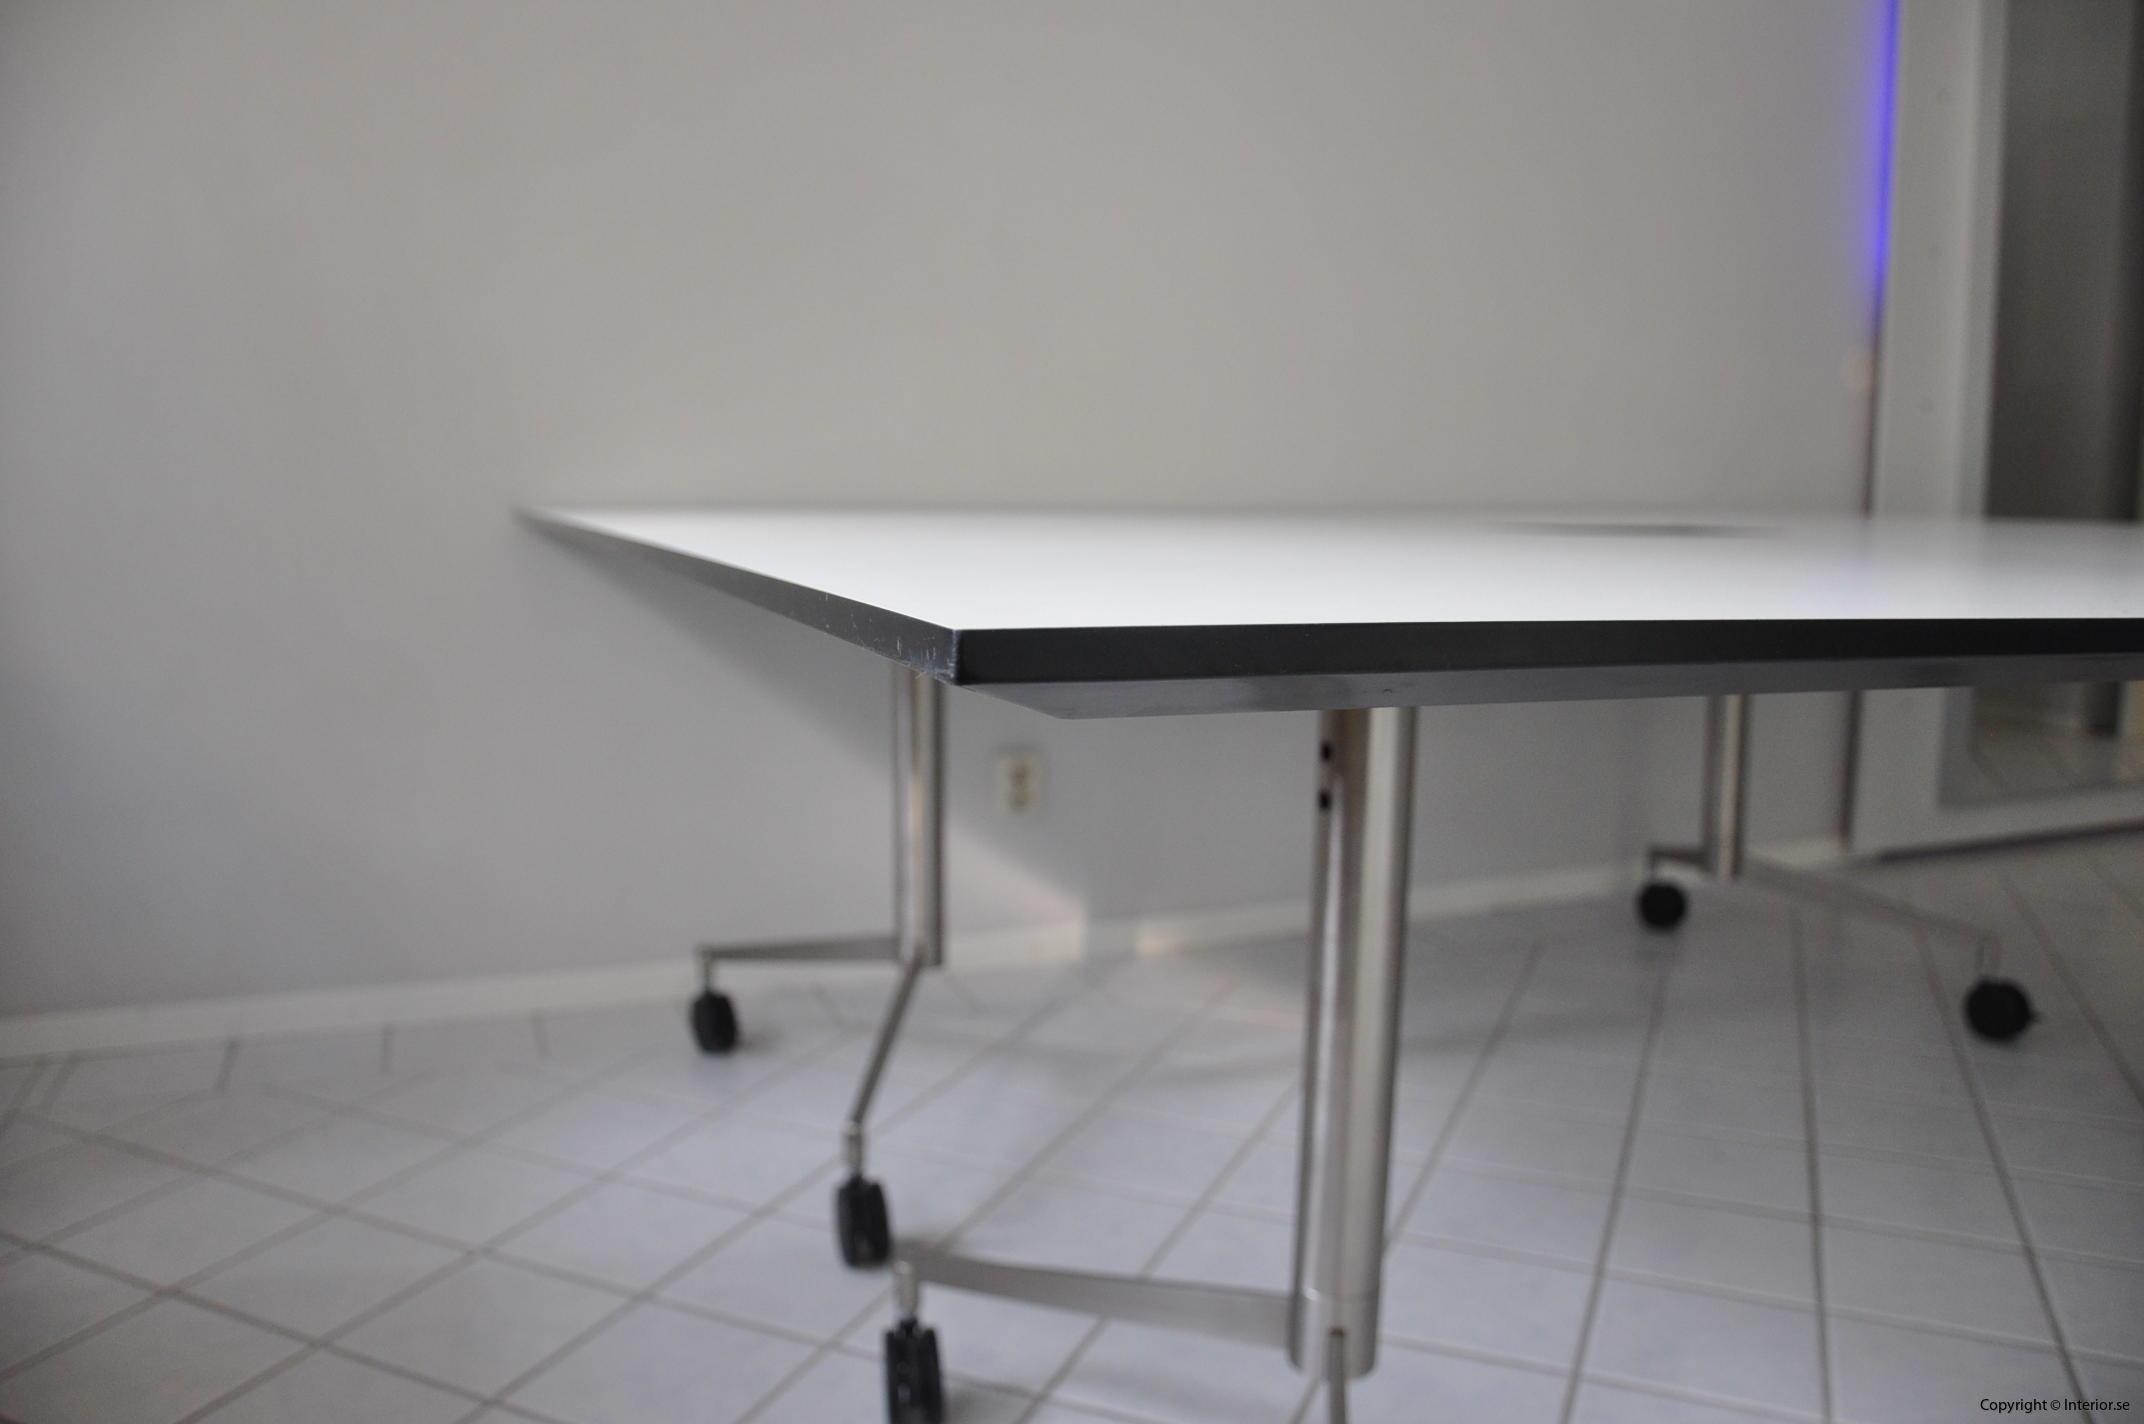 konferensbord begagnat laminat stockholm paustian furniture denmark (5)